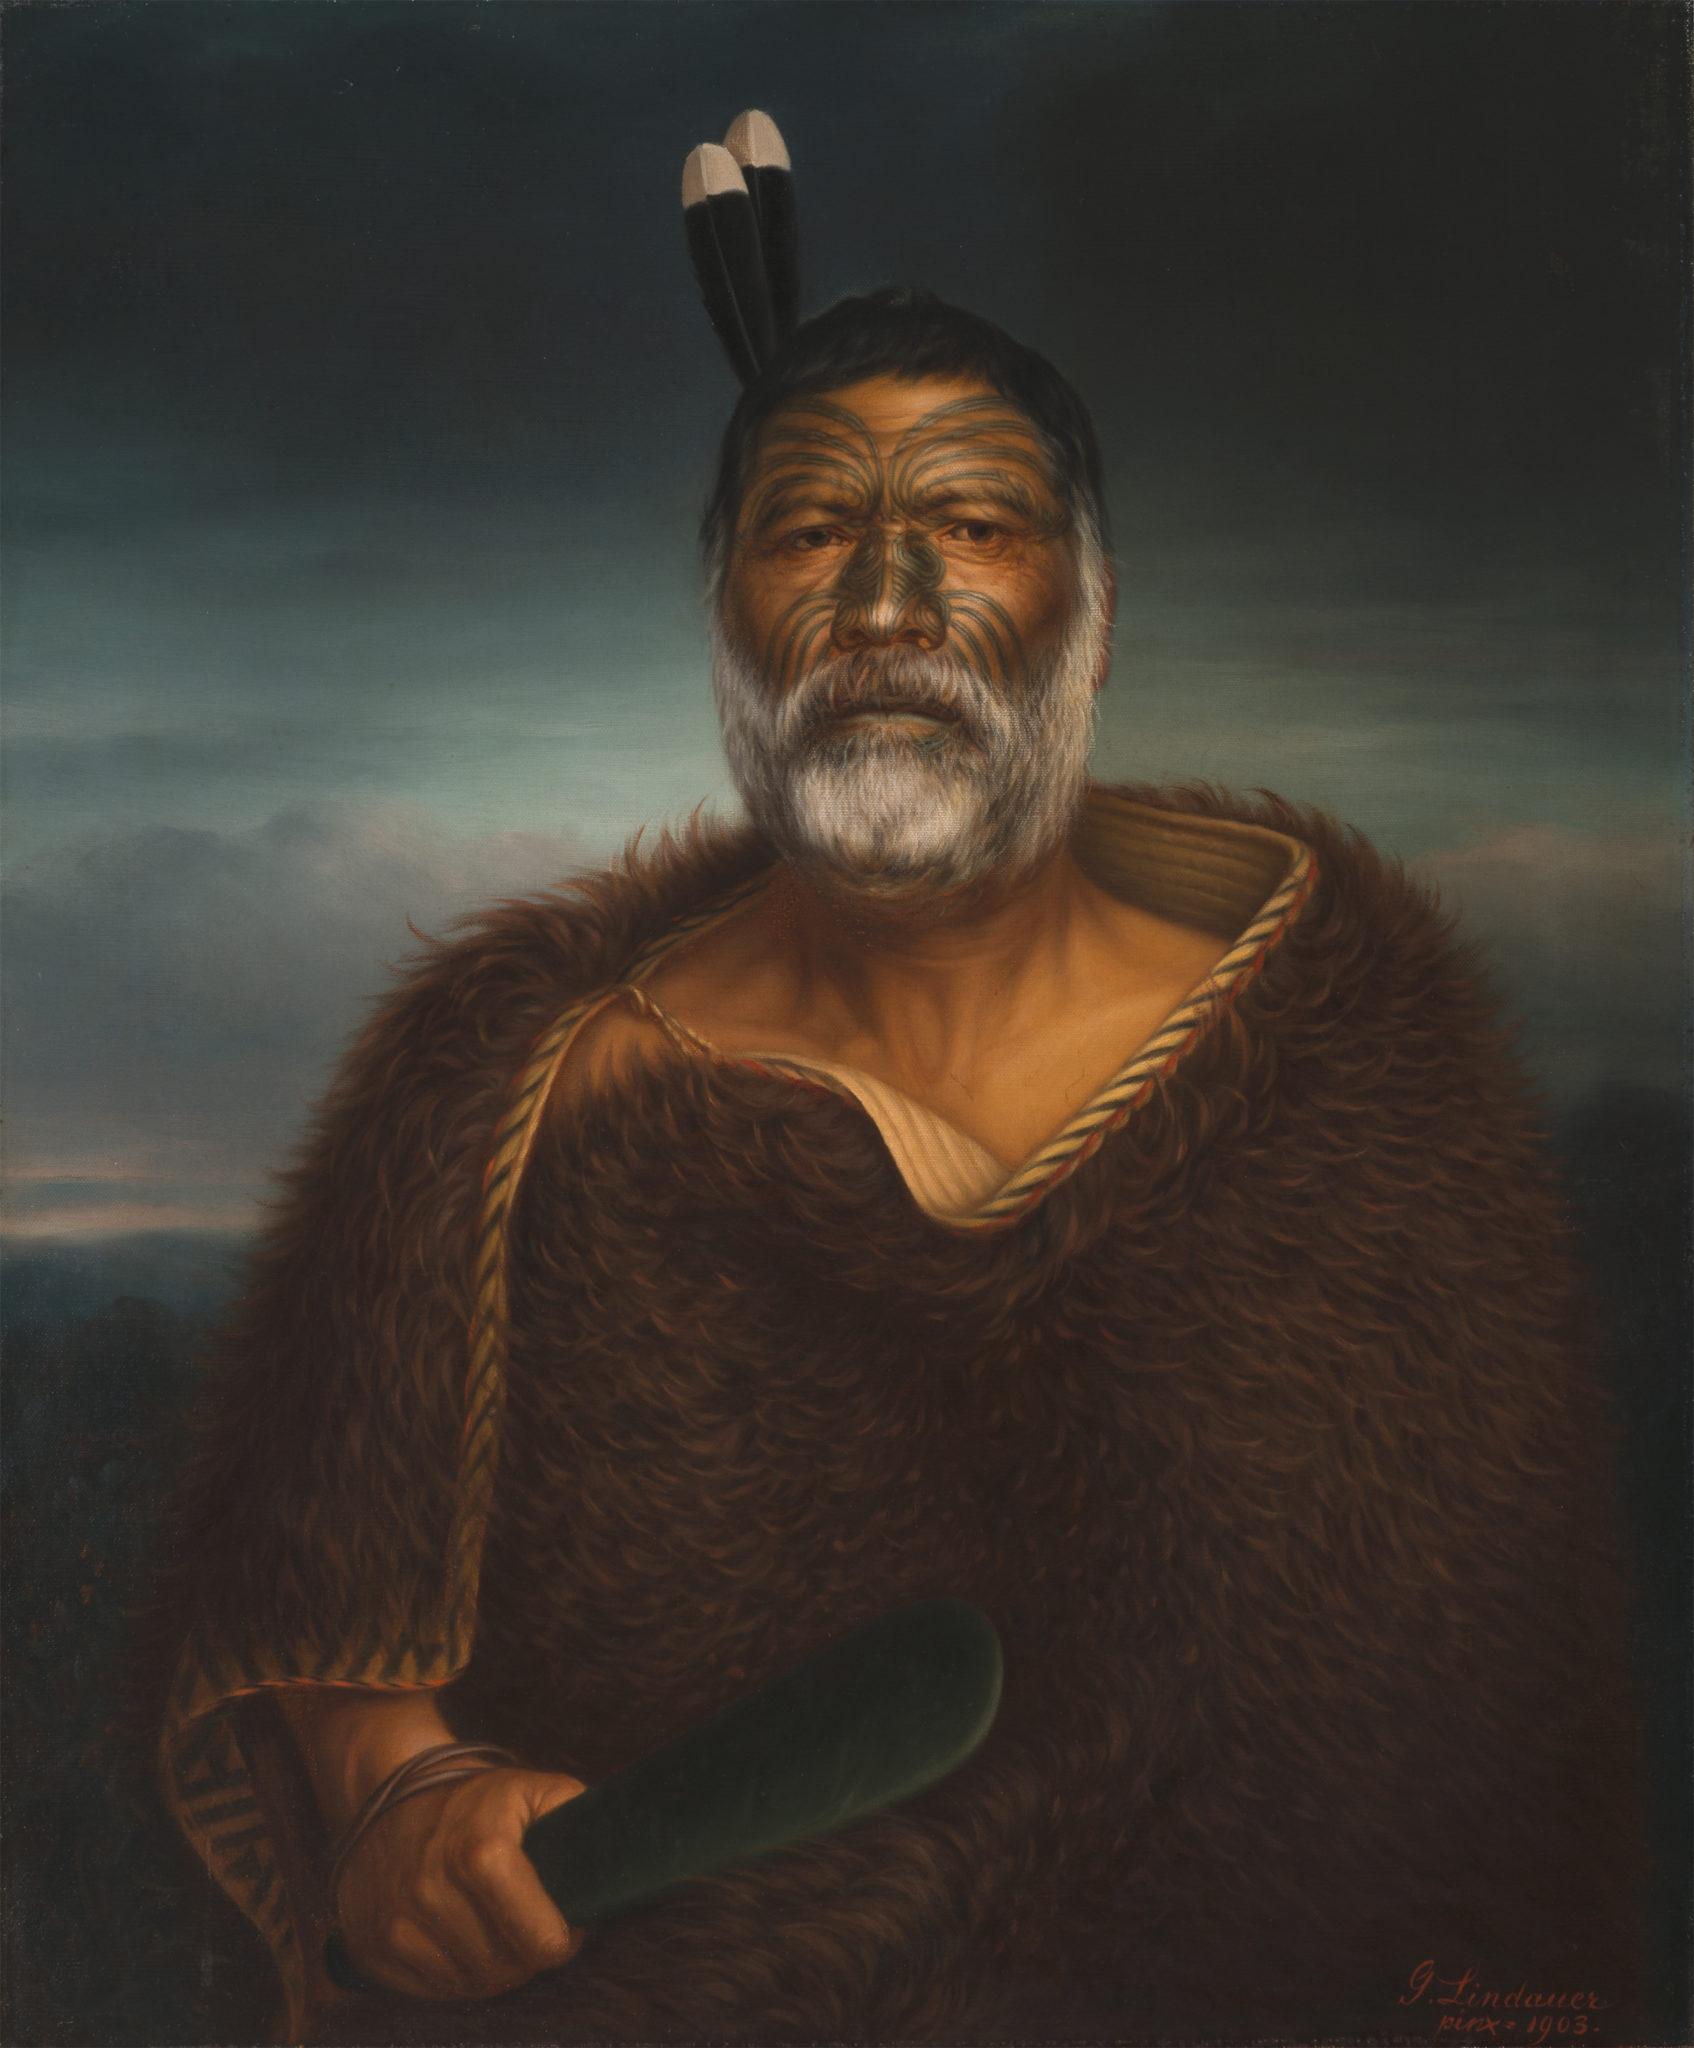 Gottfried Lindauer. The Māori Portraits in Berlin.